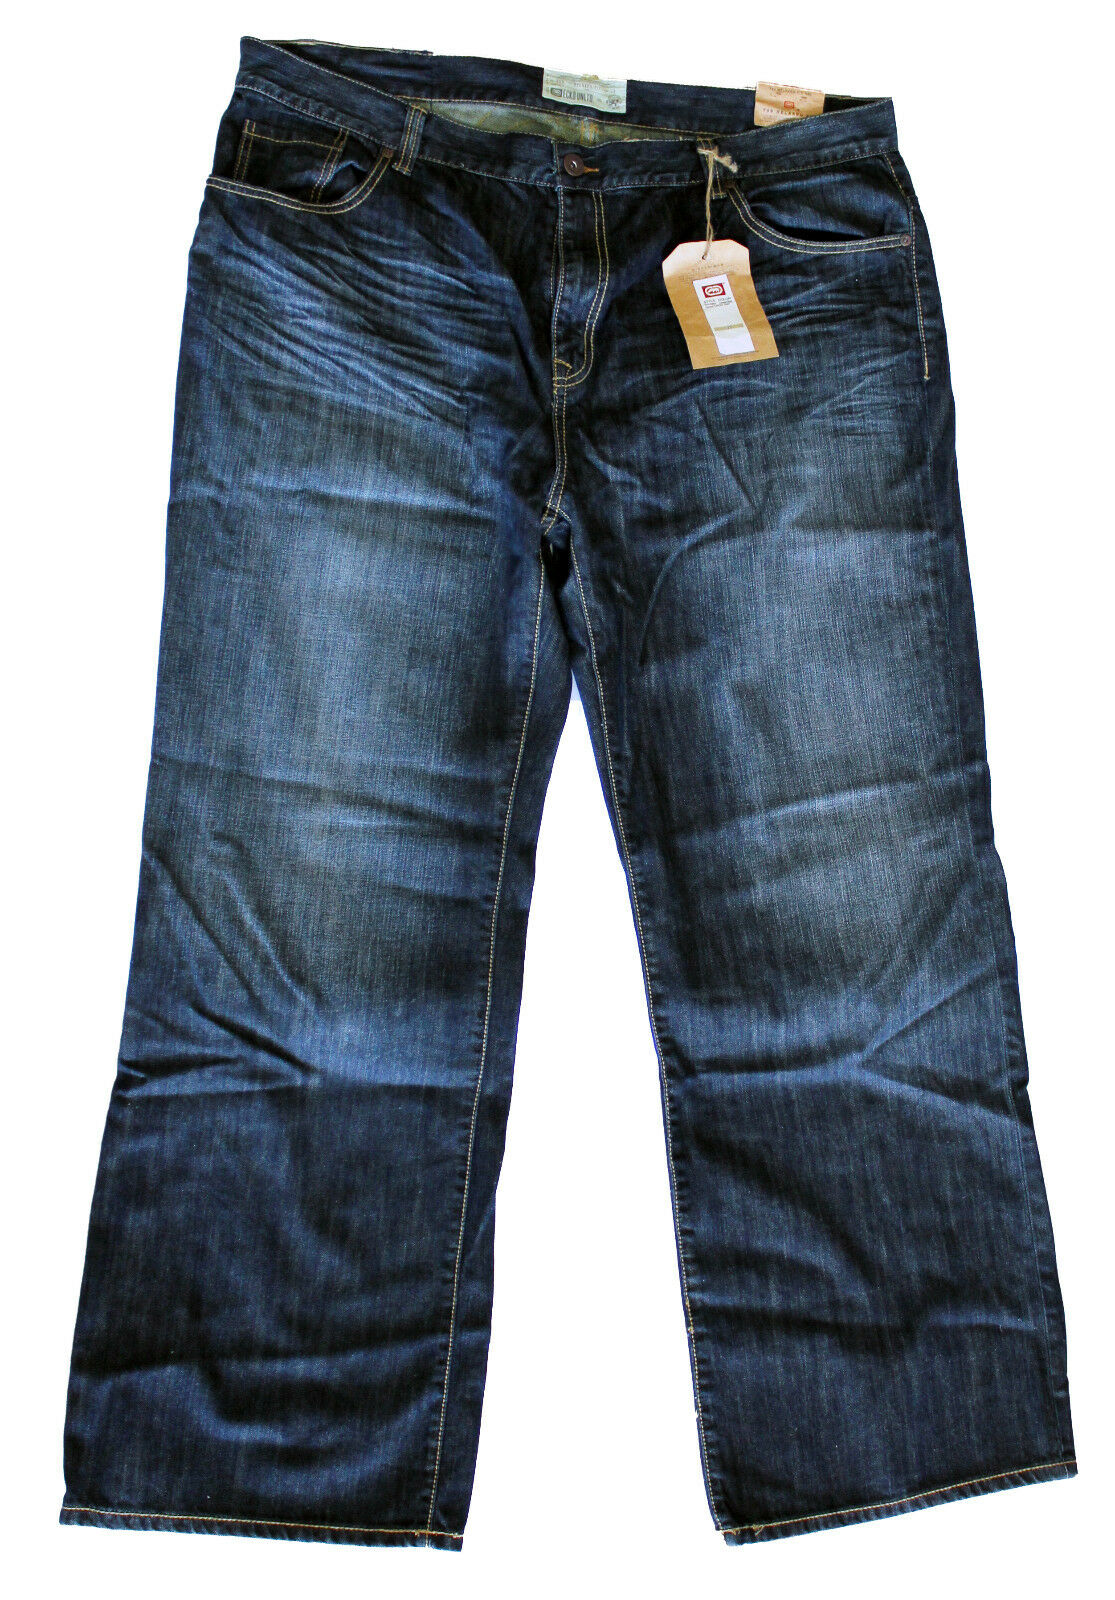 ECKO UNLTD. Rhino Center jeans relaxed fit pants pantaloni uomo taglie comode _